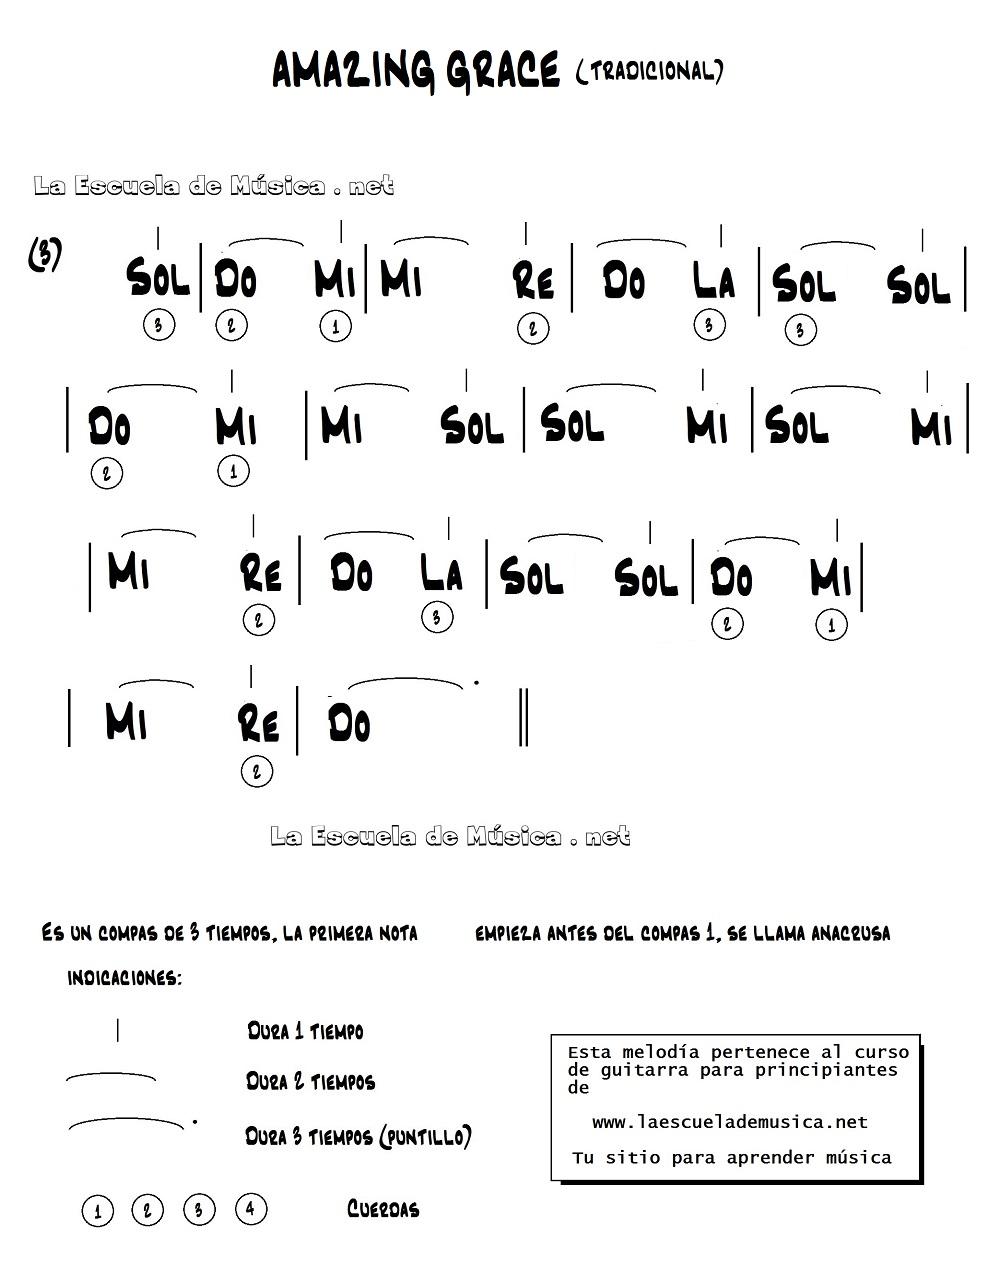 Blanca Navidad para guitarra fácil - Partitura de AMAZING GRACE